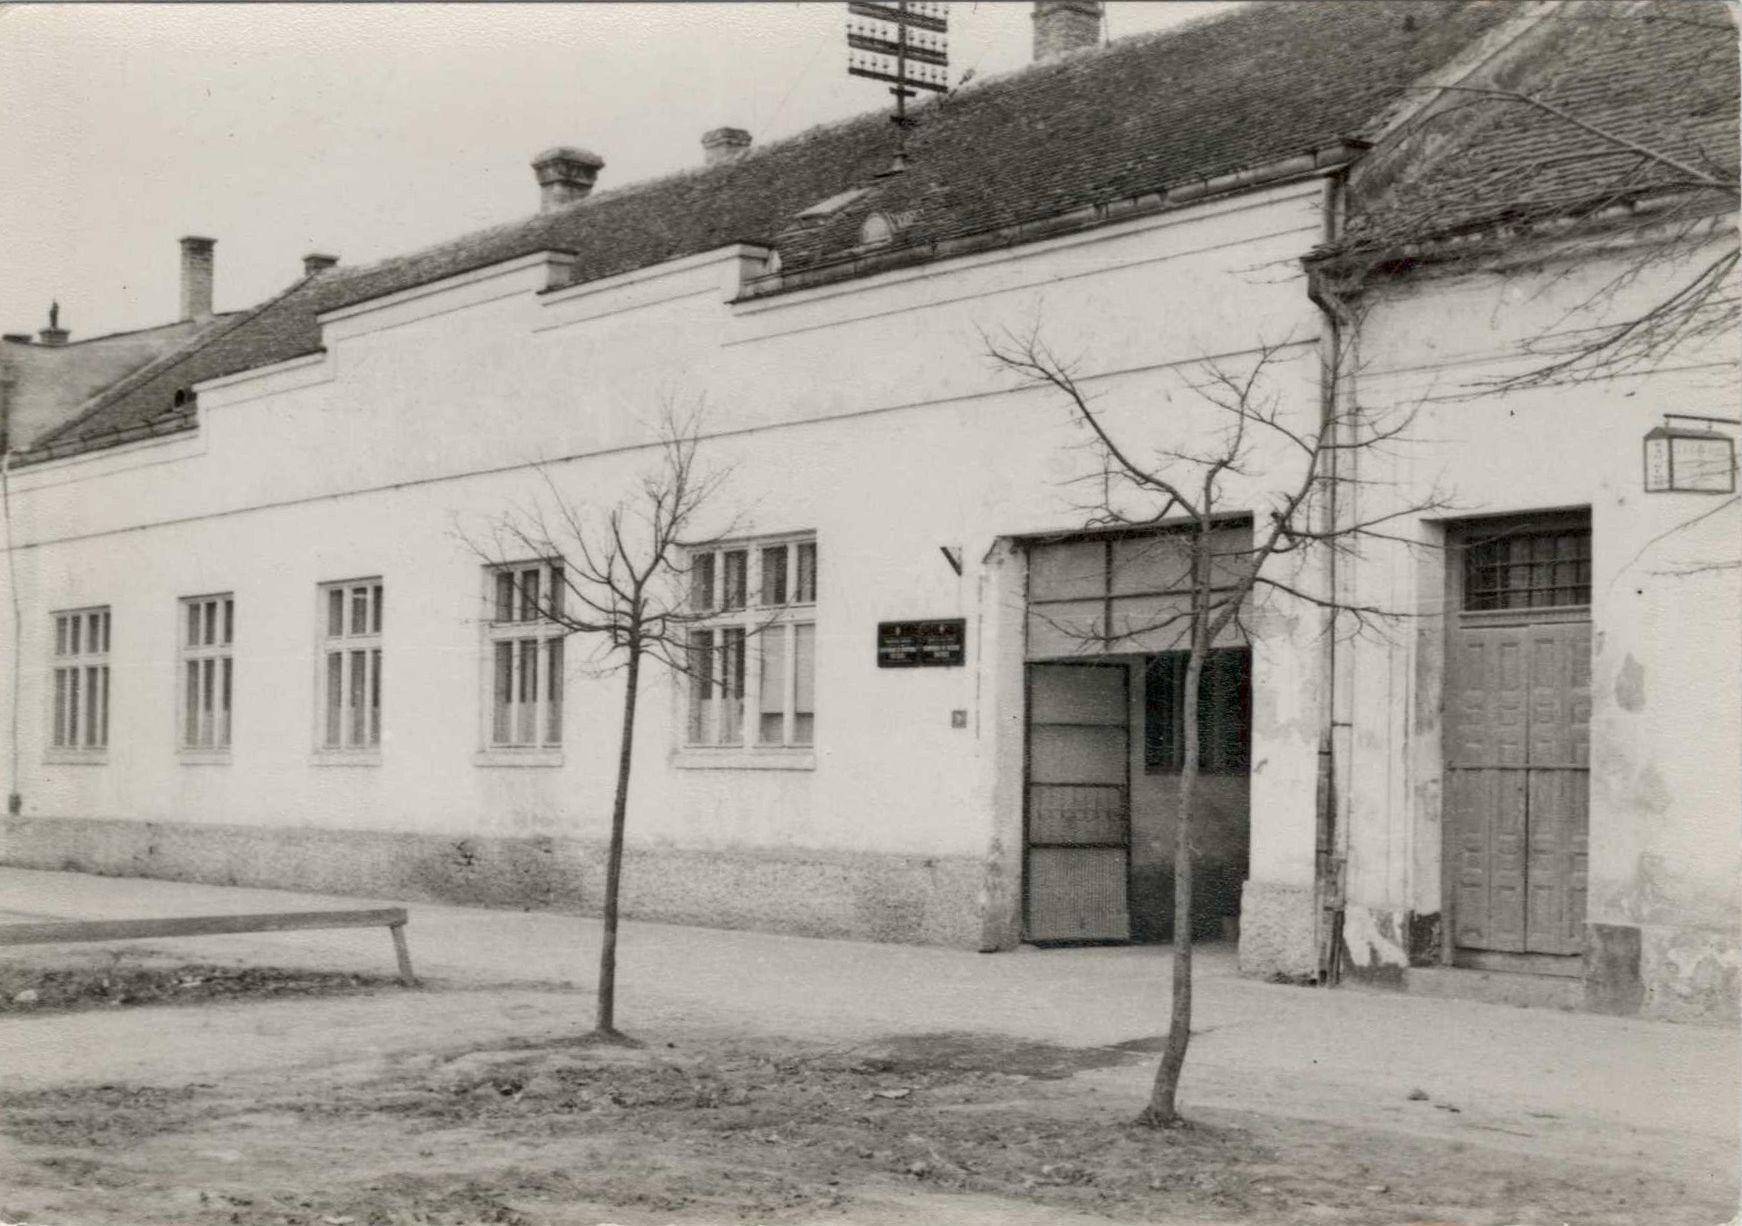 Zgrada stare opštine, Stara Pazova, druga polovina 20. veka